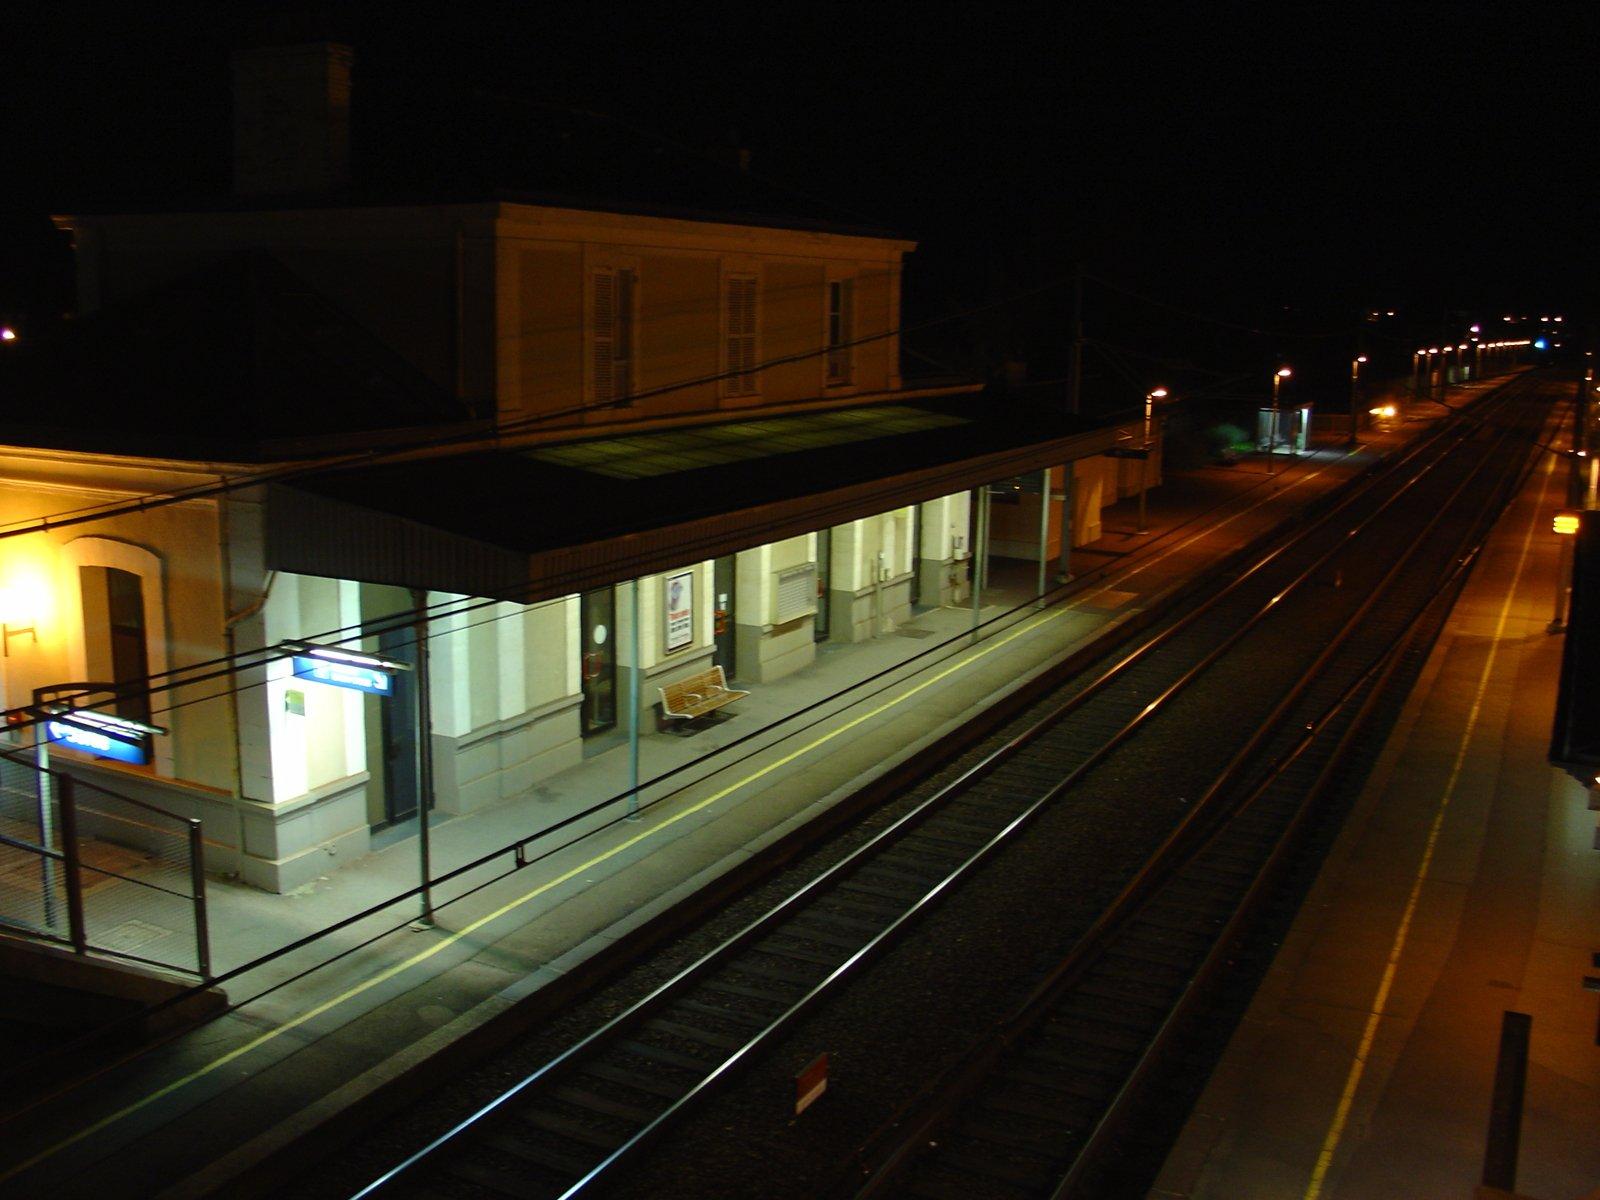 A deserted station